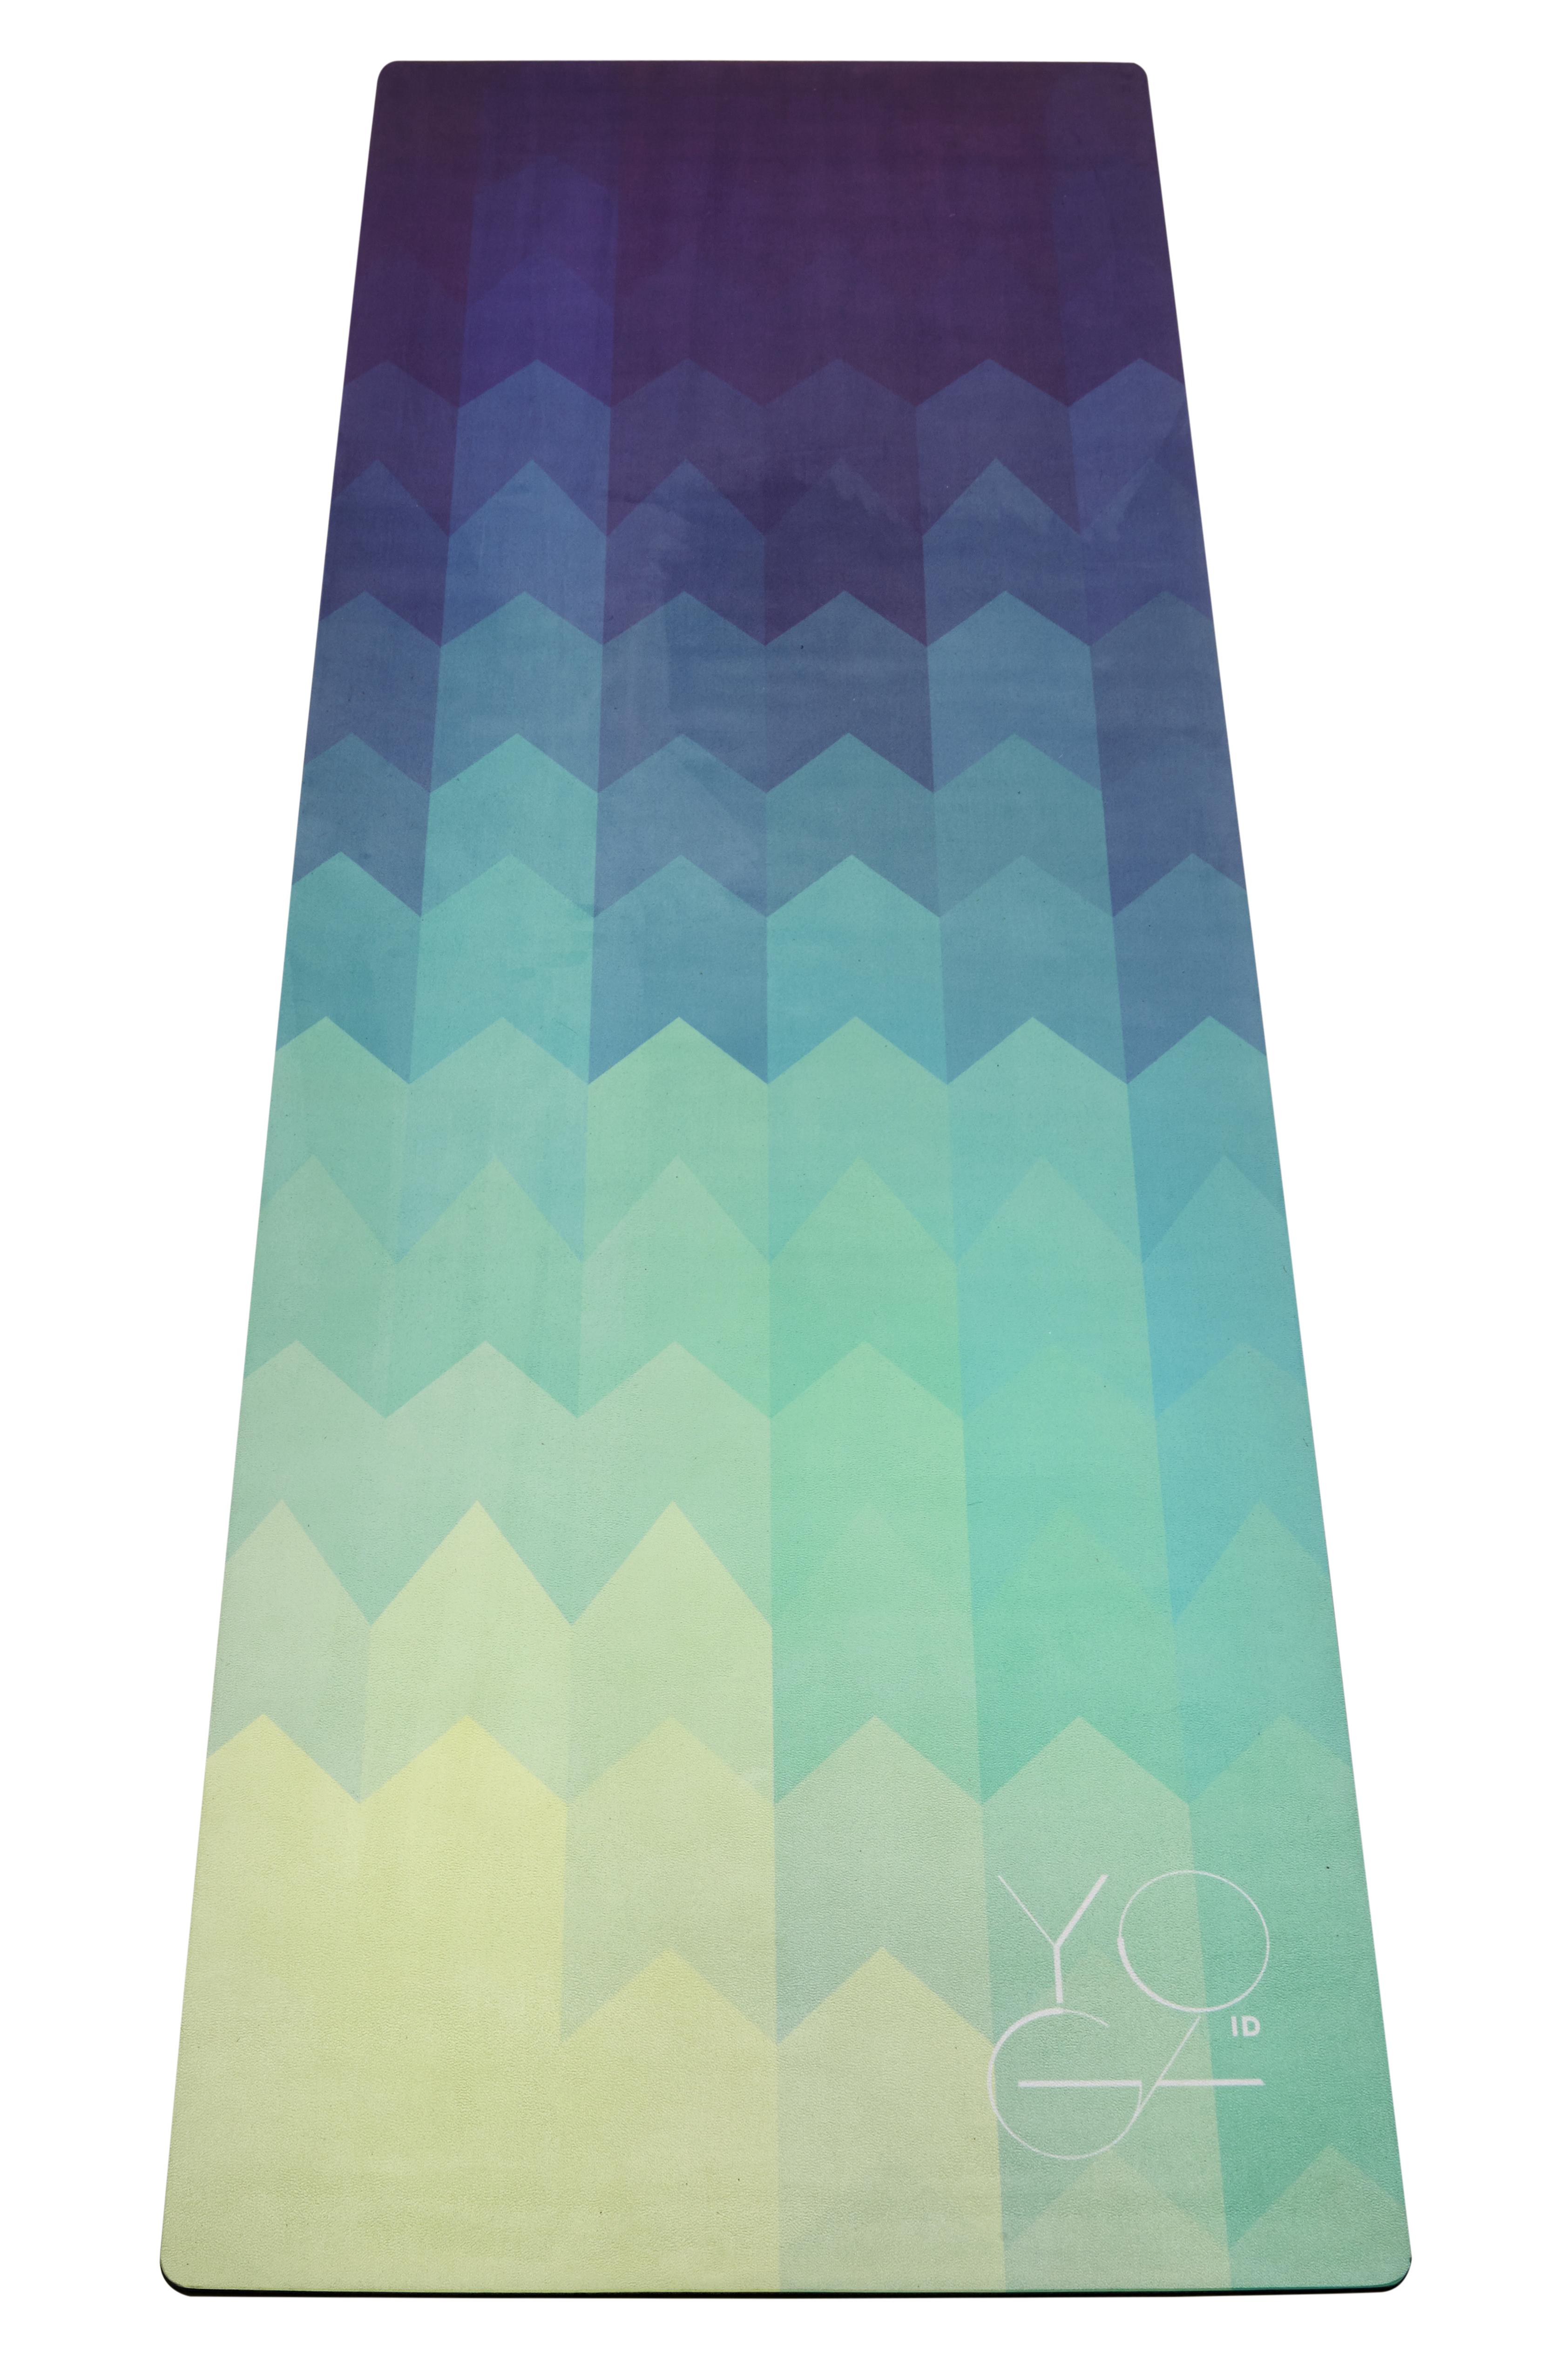 Коврик для йоги Yoga ID America , цвет: голубой, 173 х 61 х 0,3 см avengers маска captain america цвет голубой